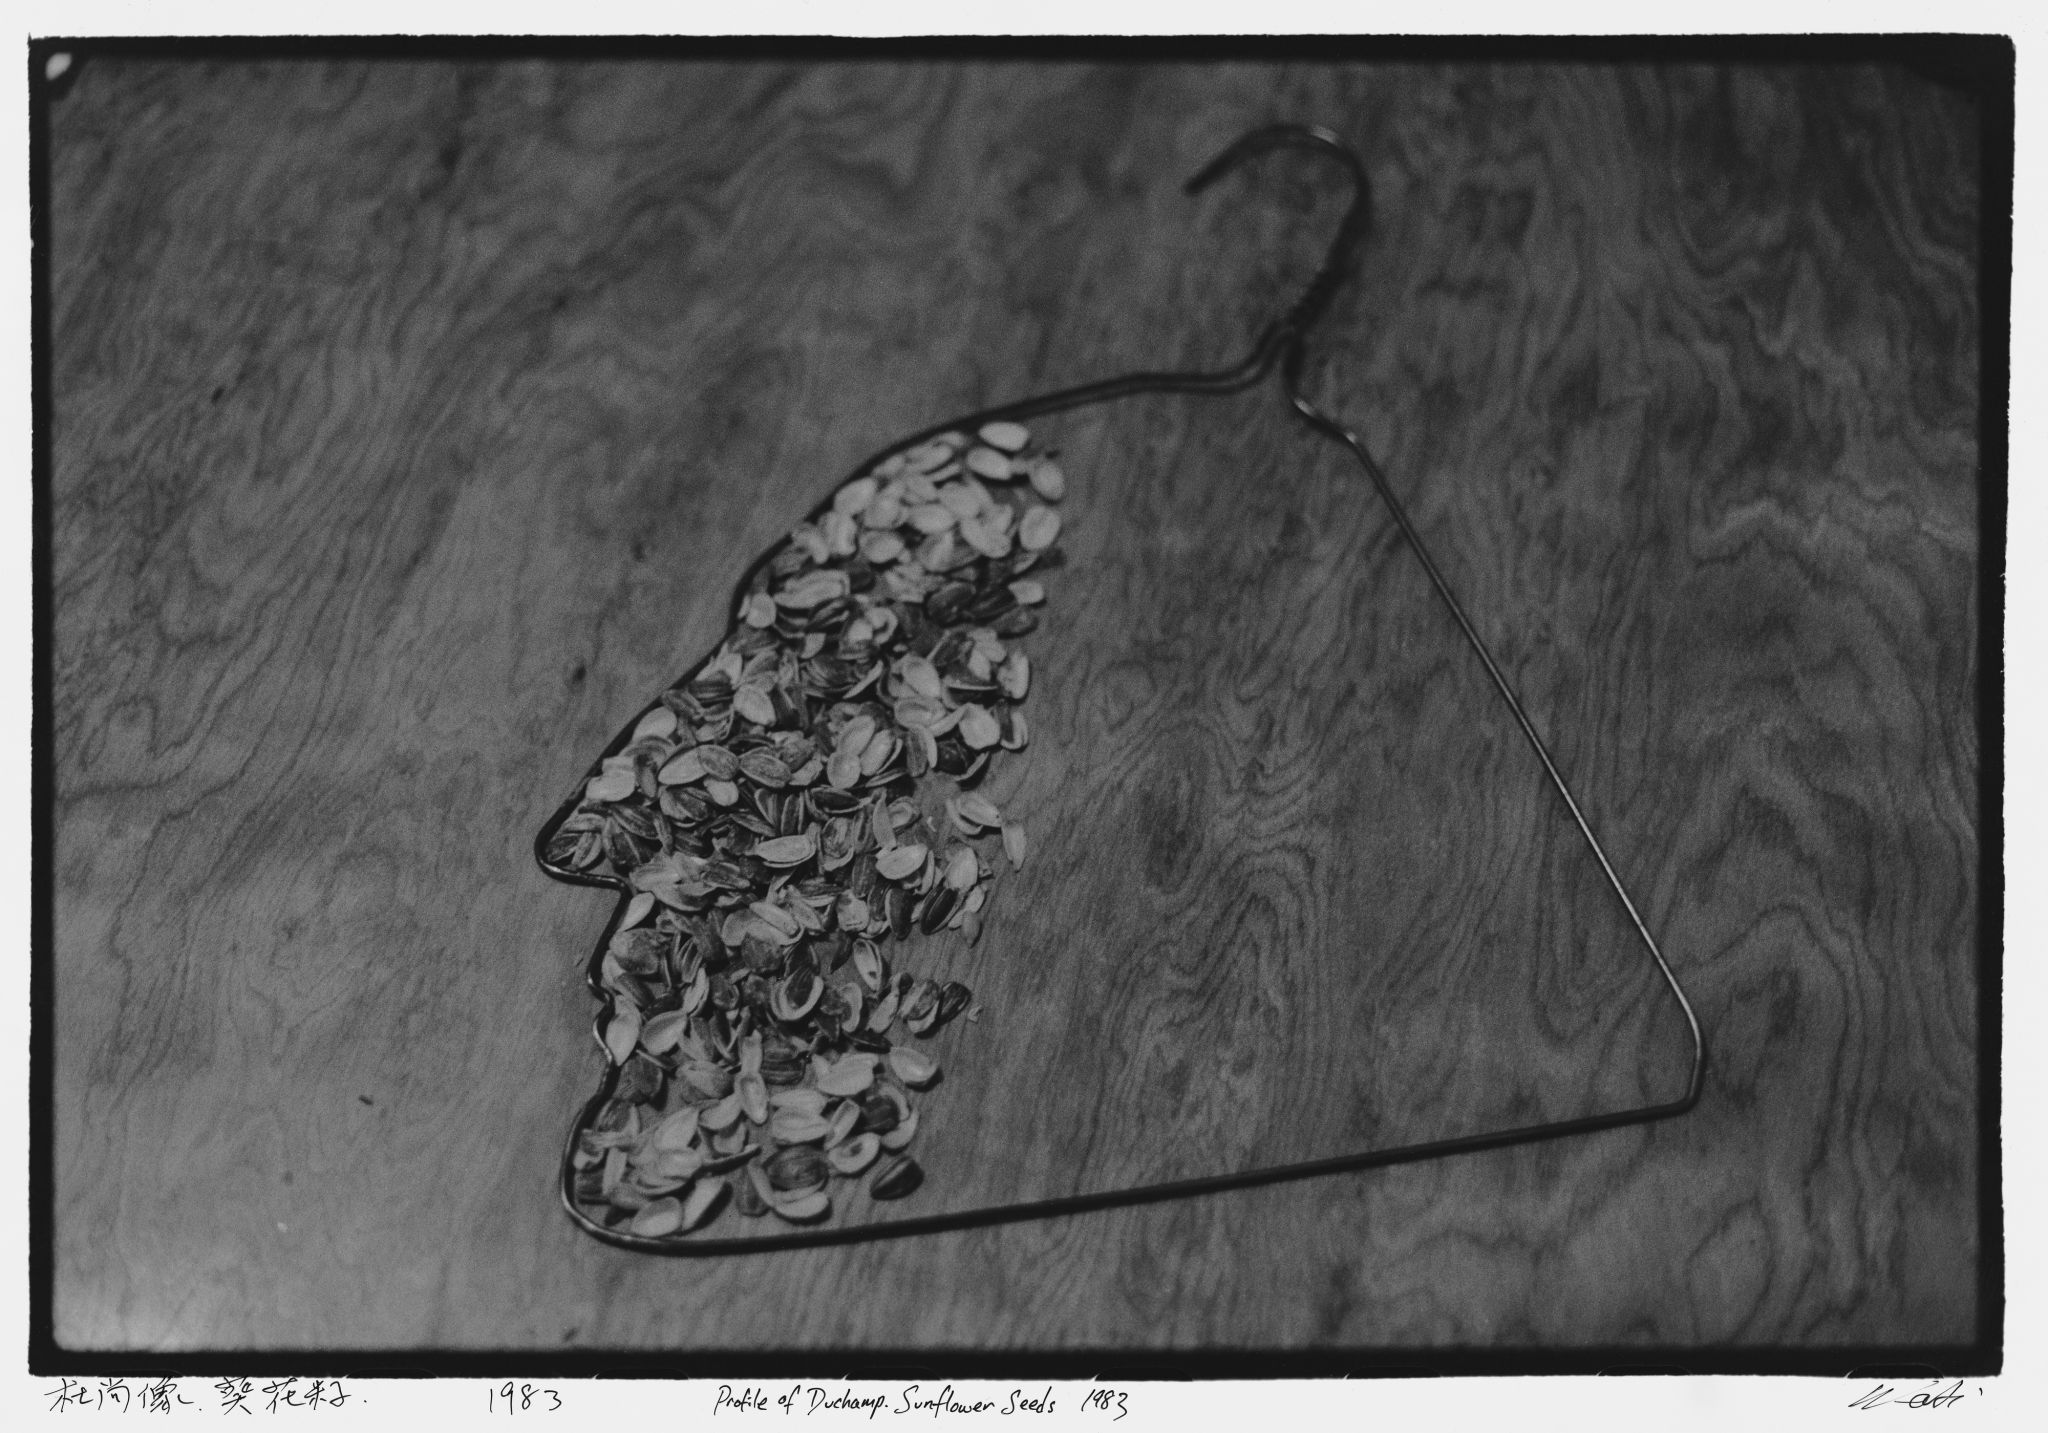 4_New York Photographs 1983-1993, Profile of Duchamp, Sunflower Seeds, 1983